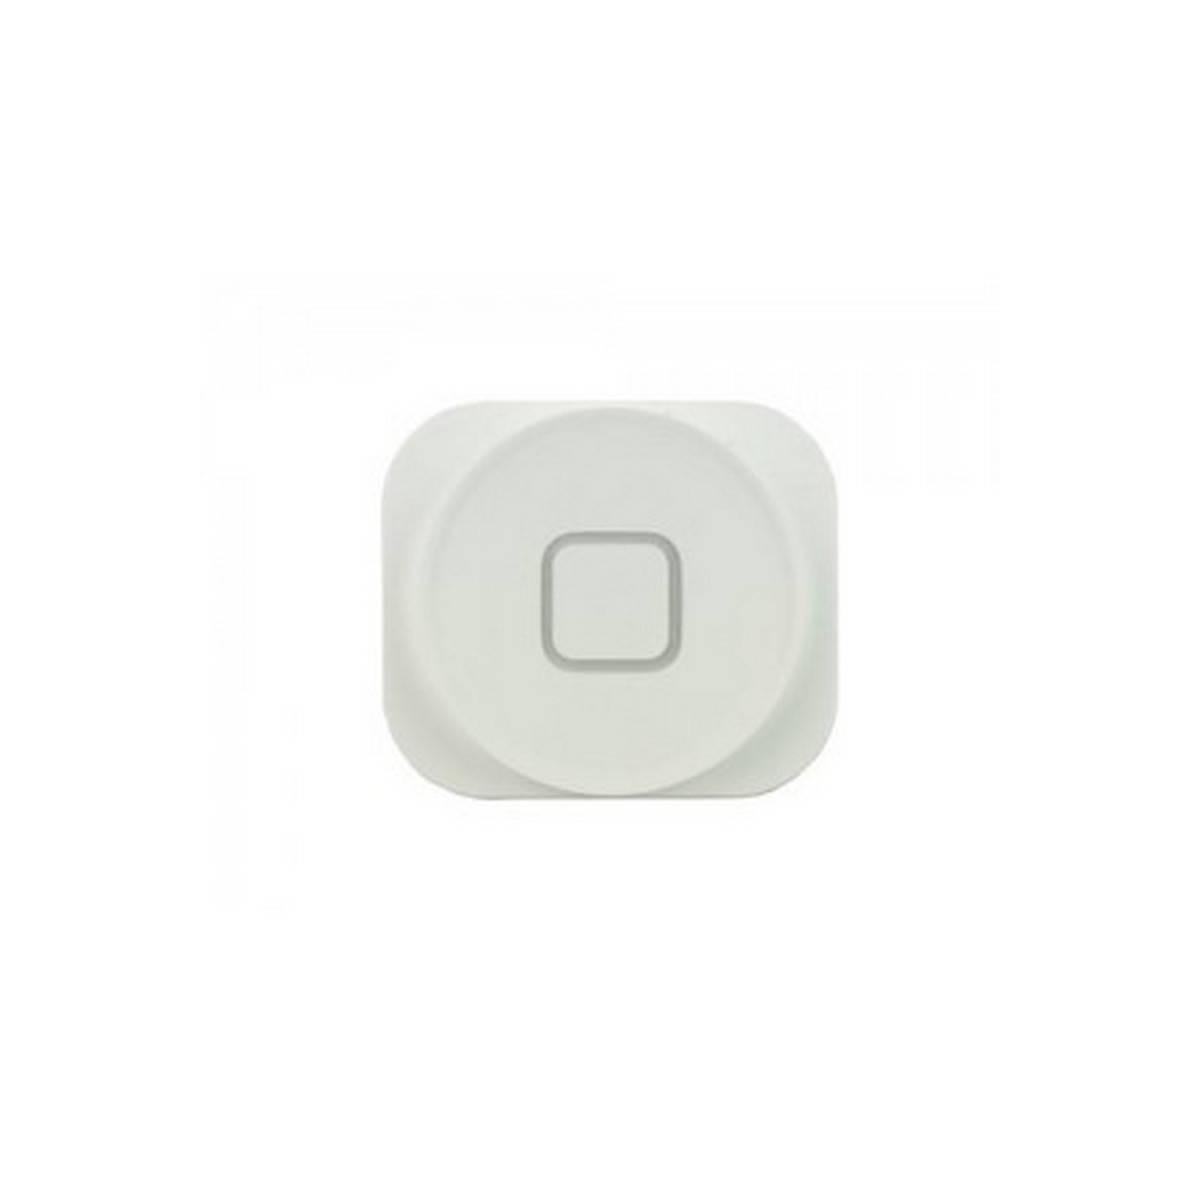 Boton HOME iPhone 5 - Blanco